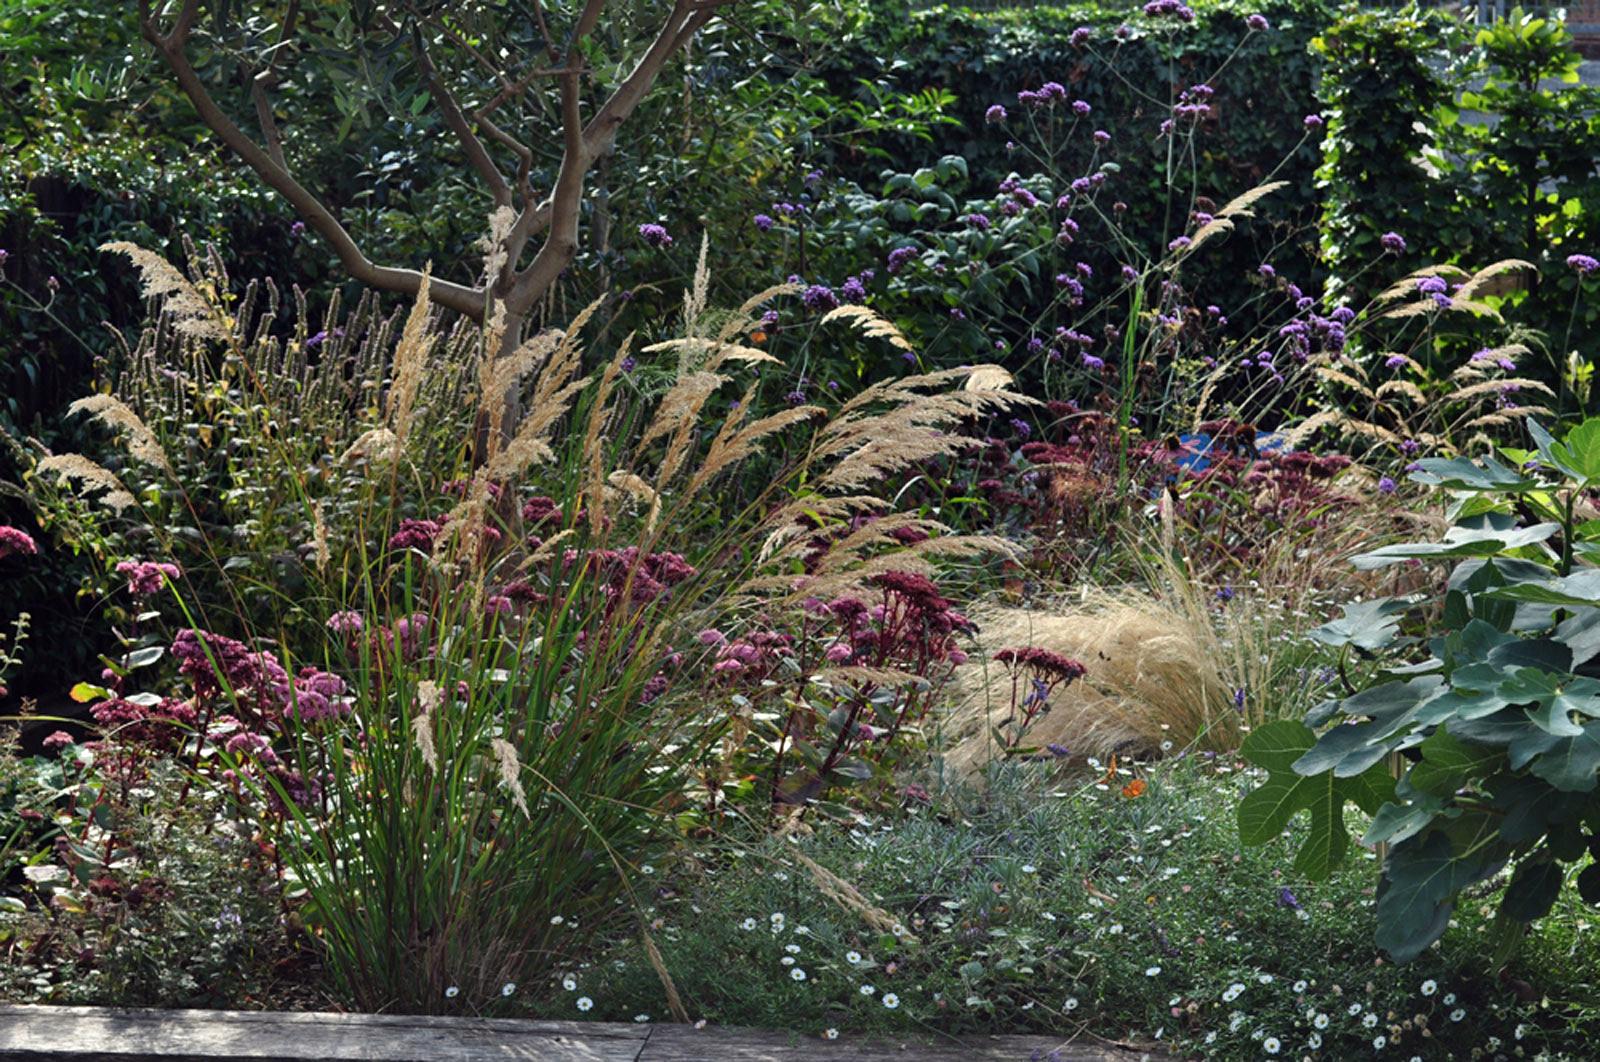 sedum-stipa-verbena-flowering-Late-summer